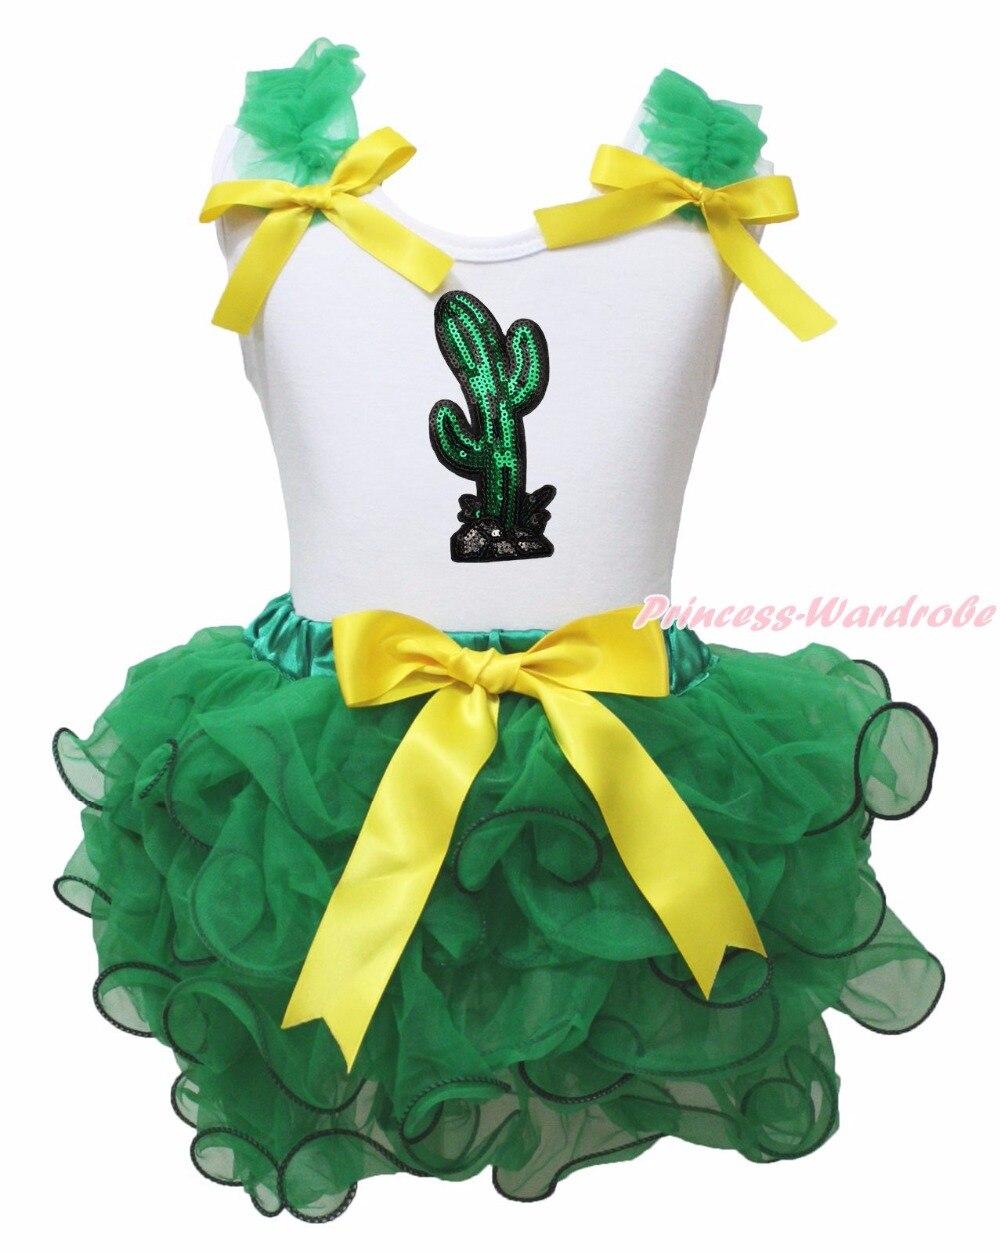 Mexico Cinco de Mayo Bling Cactus White Top Green Girls Petal Skirt Outfit NB-8Y emmanuel y mijares mexico